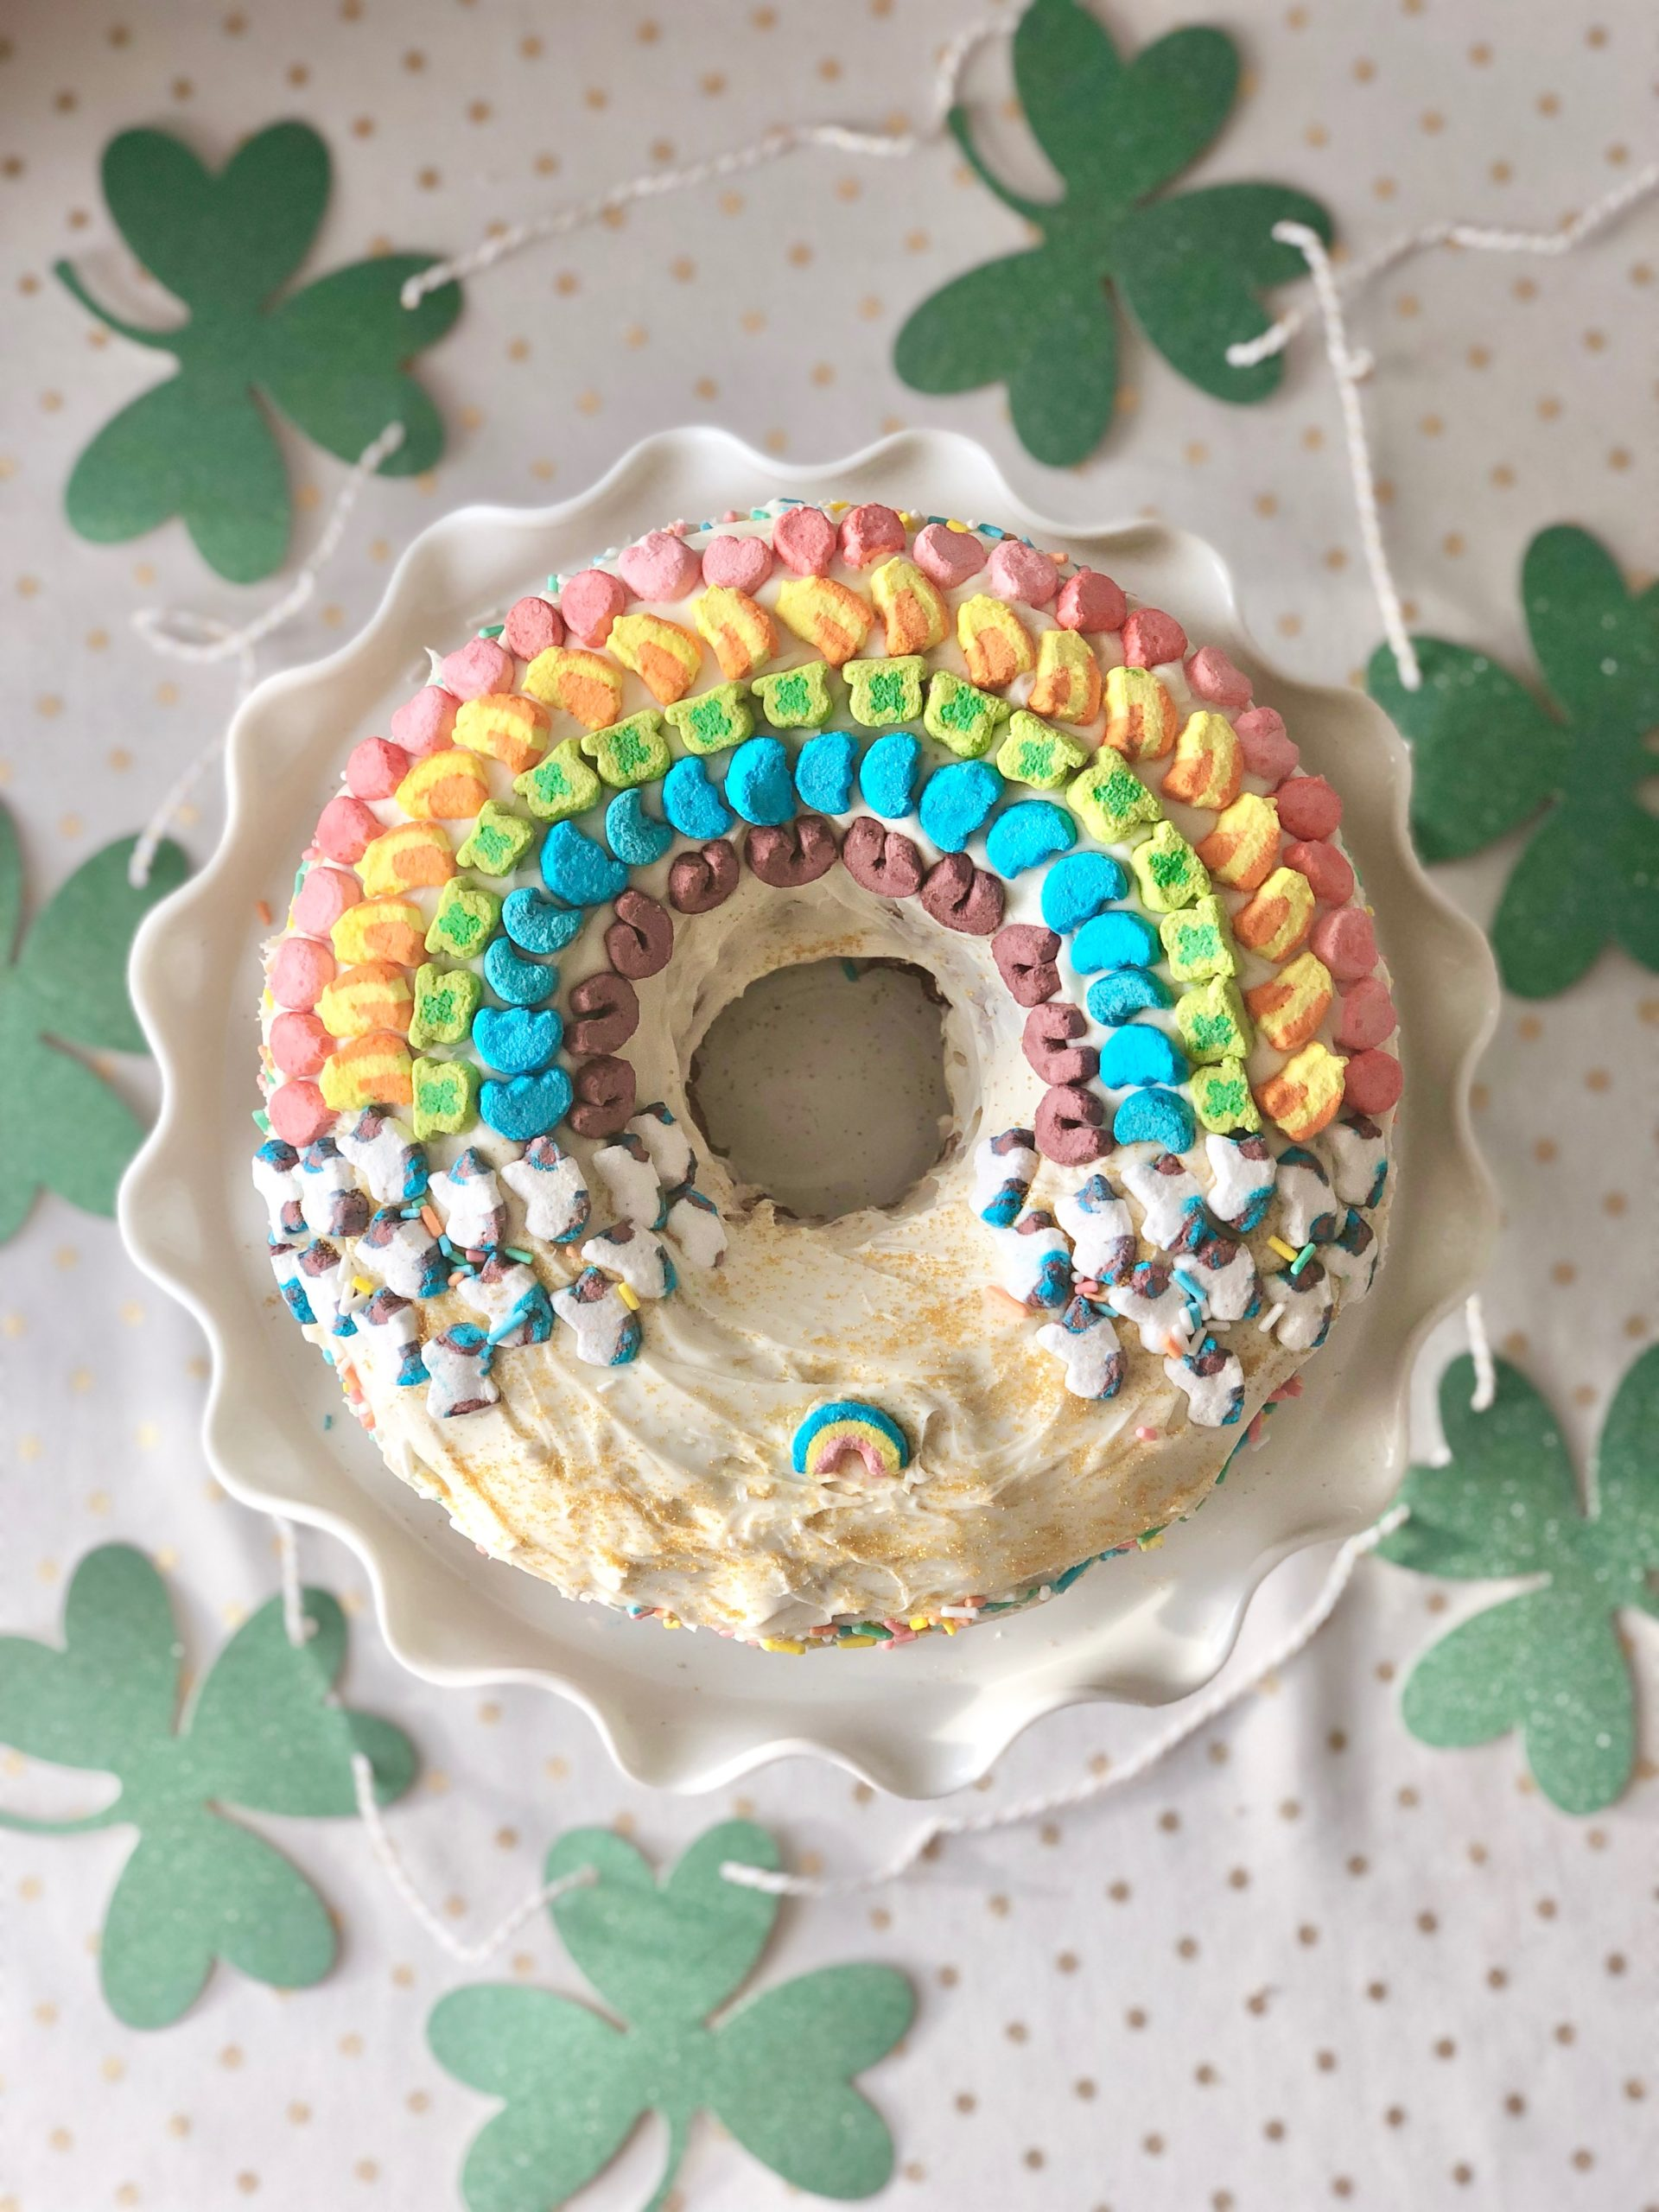 St. Patrick's Day: 5 Fun Desserts to Make With Your Kids Miami Moms Blog Becky Salgado